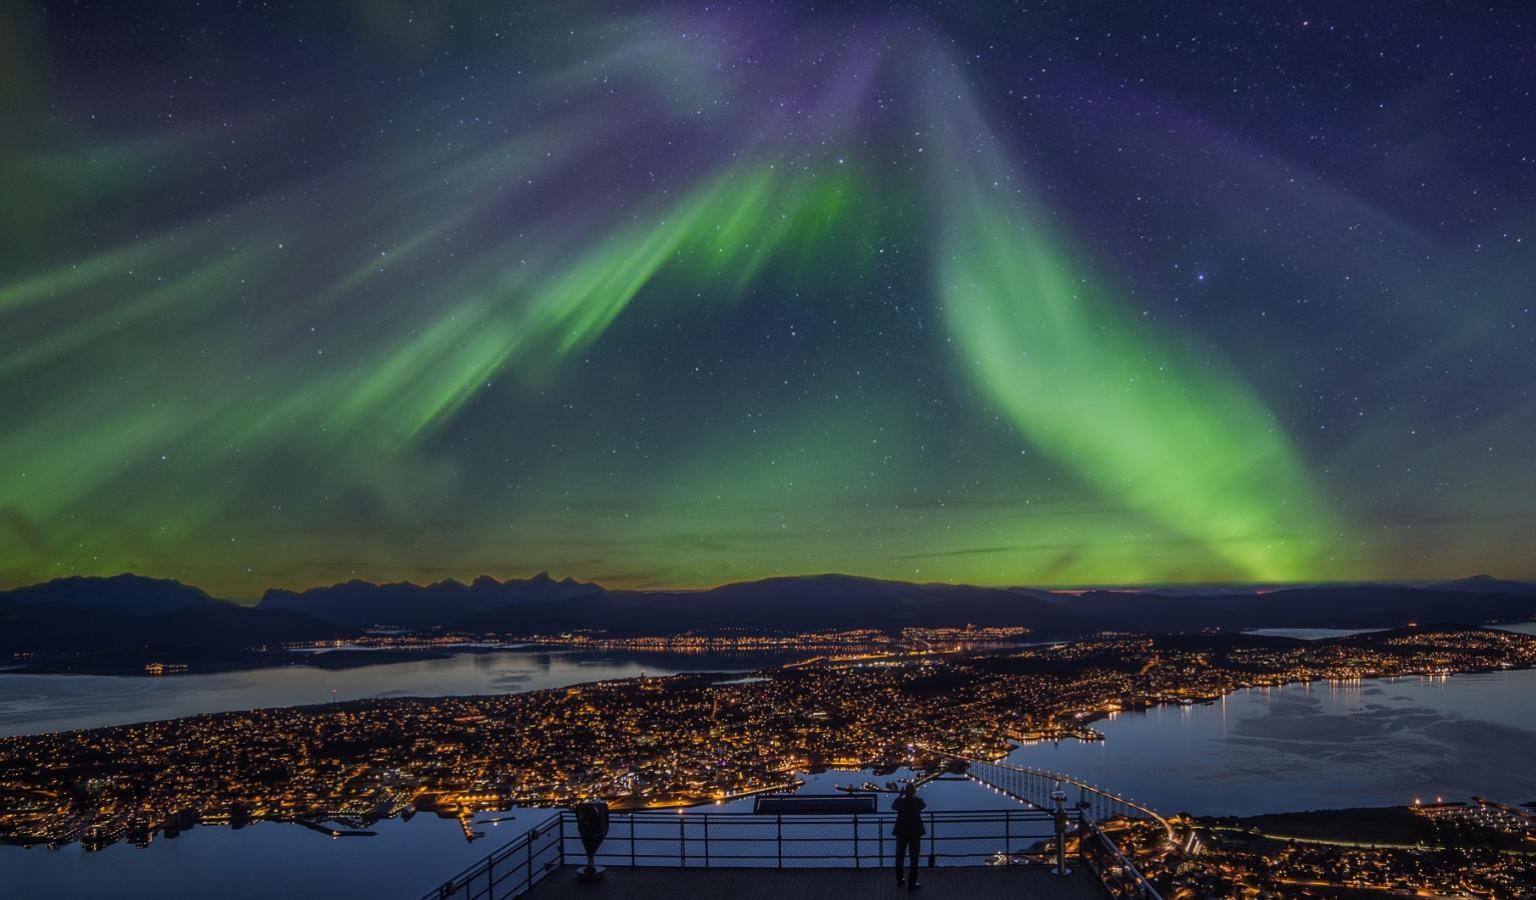 aurora_night_in_tromso_-_truls_tiller_we